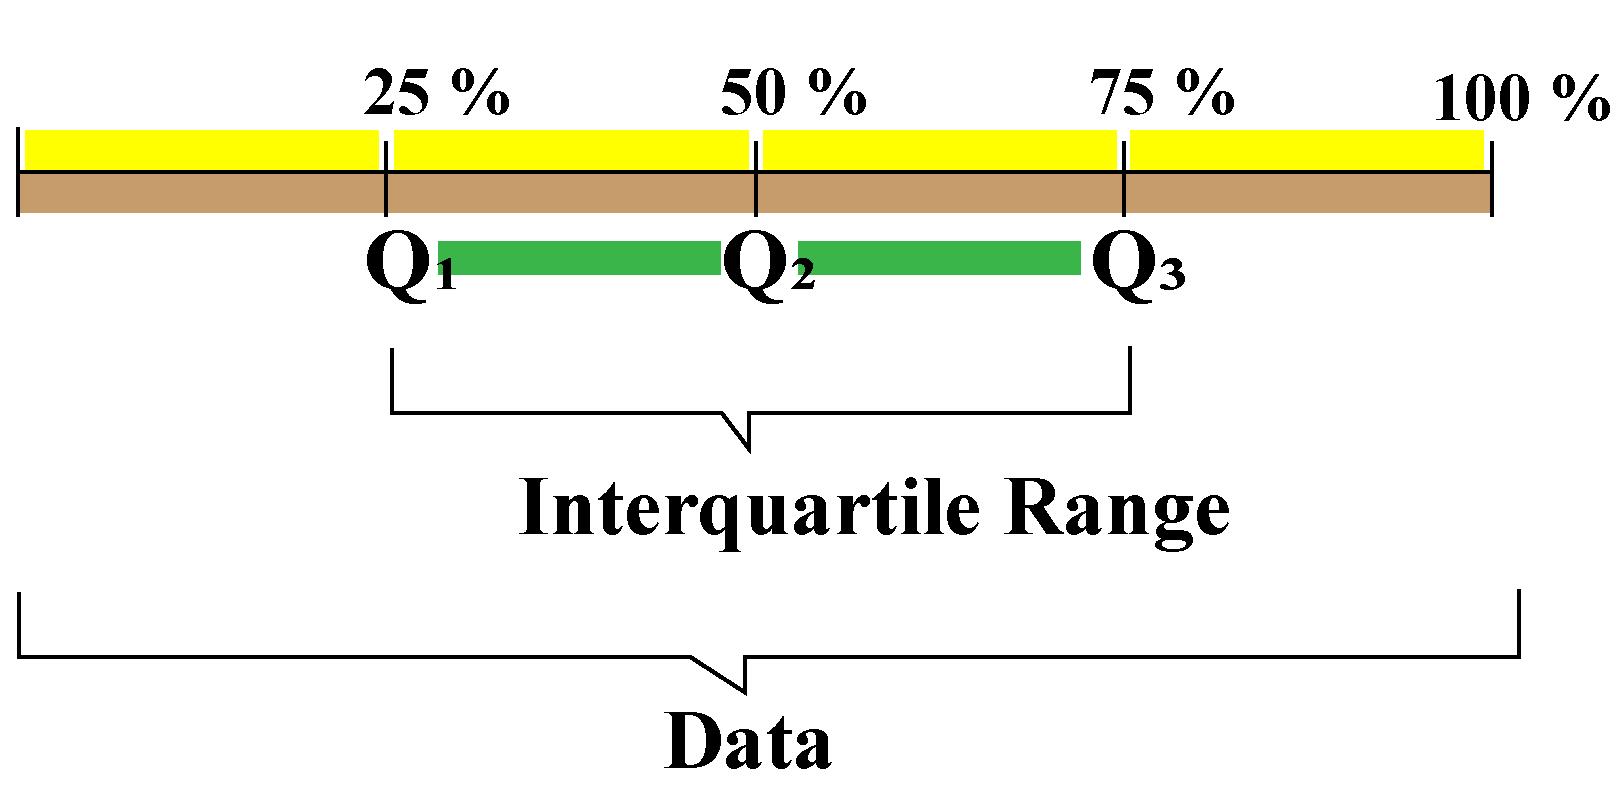 Interquartile range display